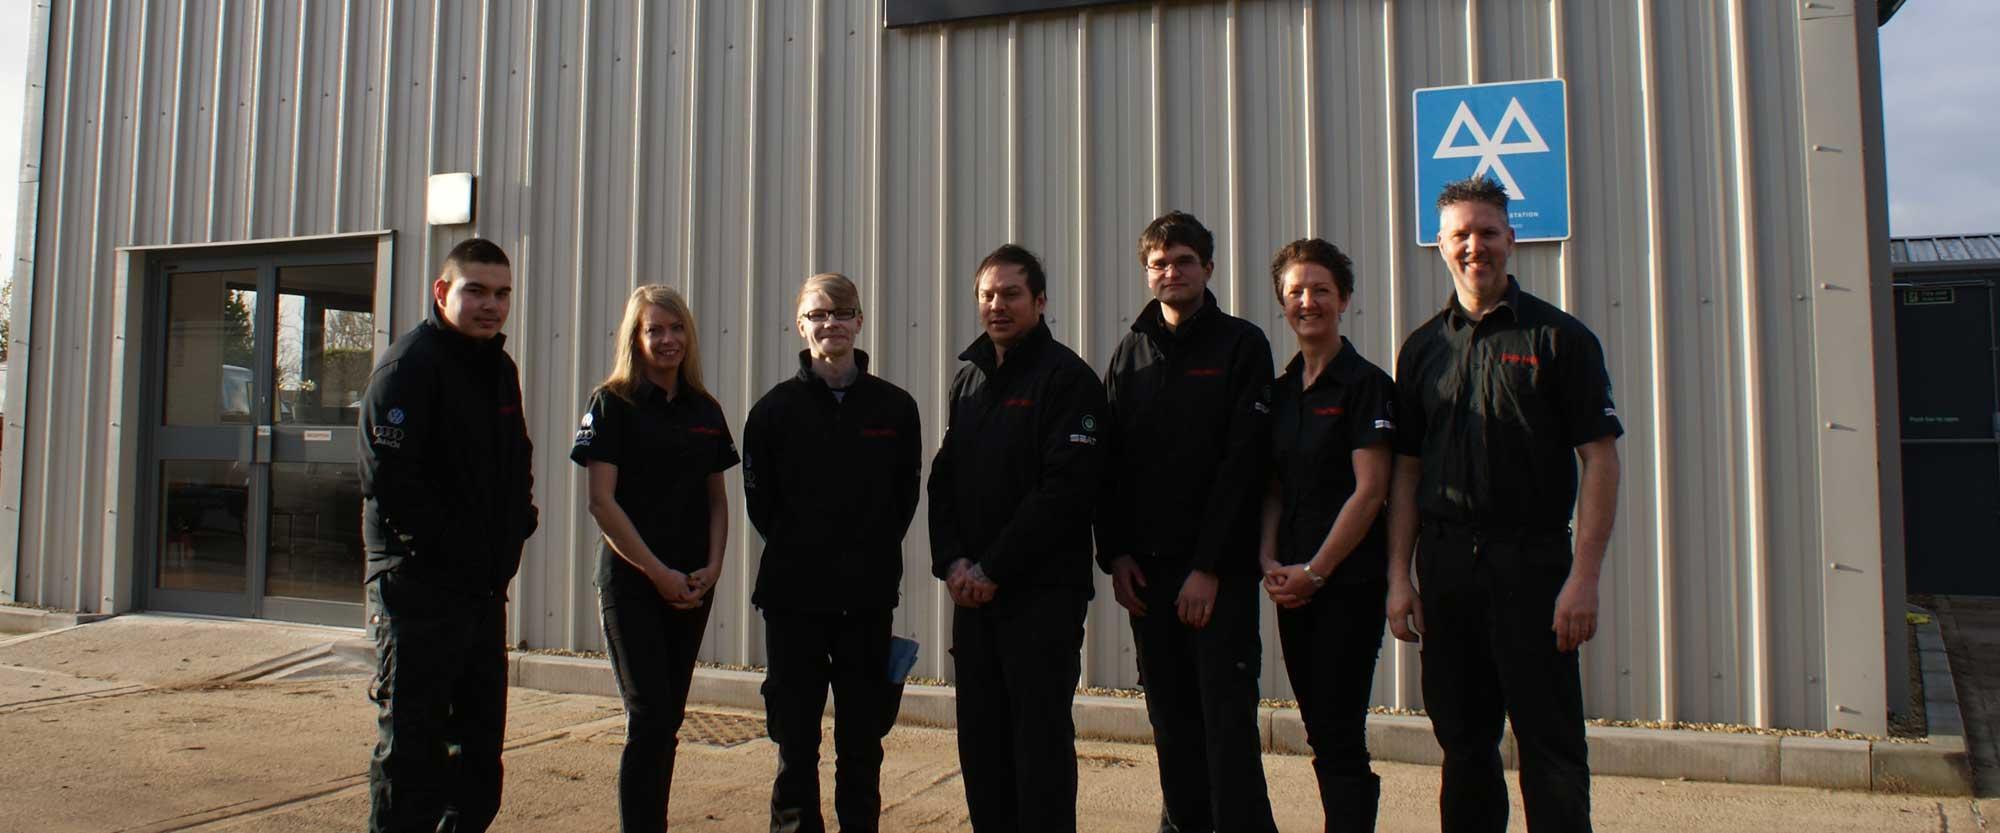 Local independent Volkswagen, Audi, Seat and Skoda car repair specialists